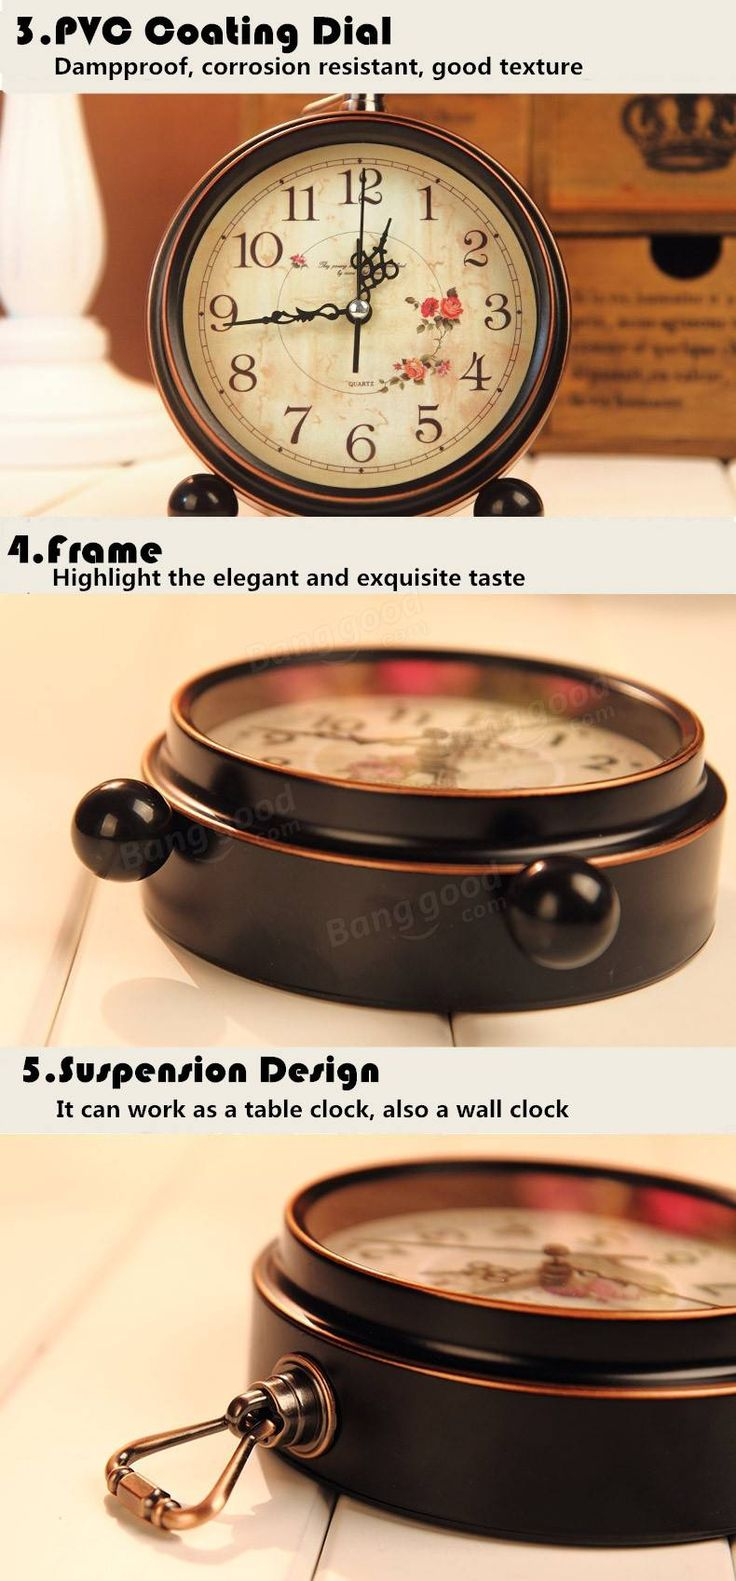 Reloj de la vendimia aralm reloj de pared Mesa de estilo retro rural casa reloj decorativo decoración